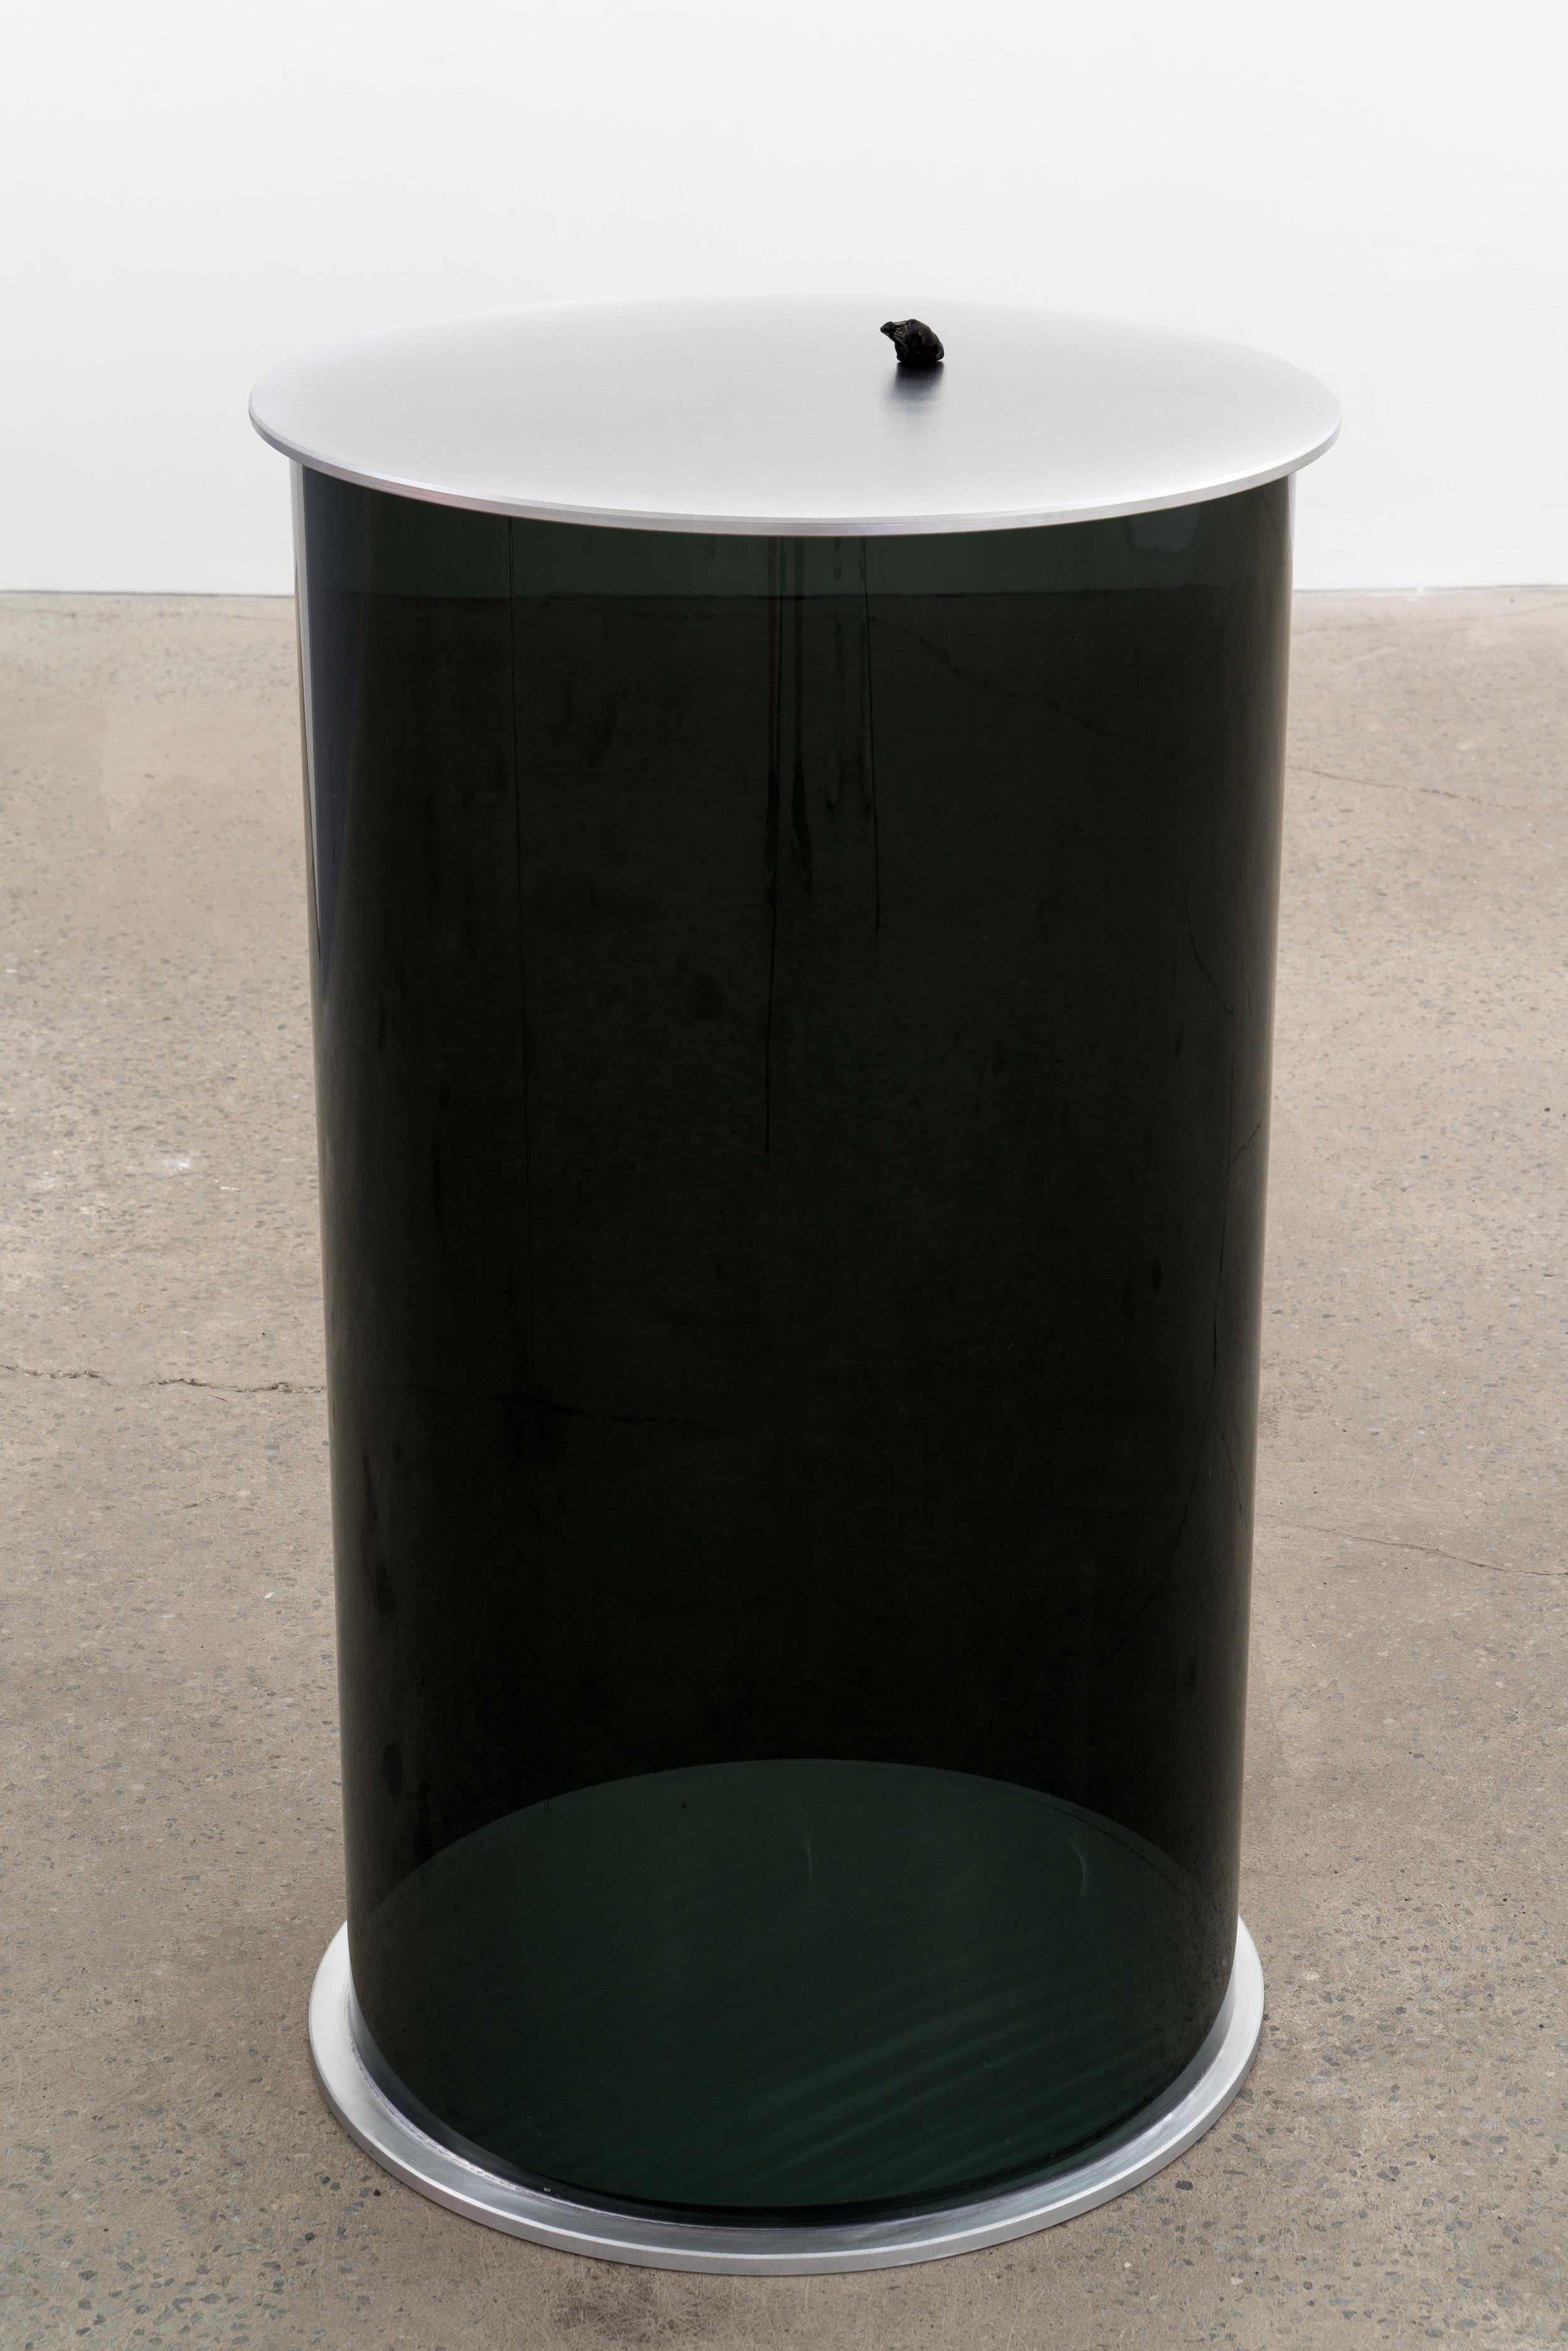 "Carl Trahan,  Der Rib , 2018, météorite, plexiglas et aluminium, 94 x 53 x 53 cm (37"" x 21.5"" x 21.5"")"